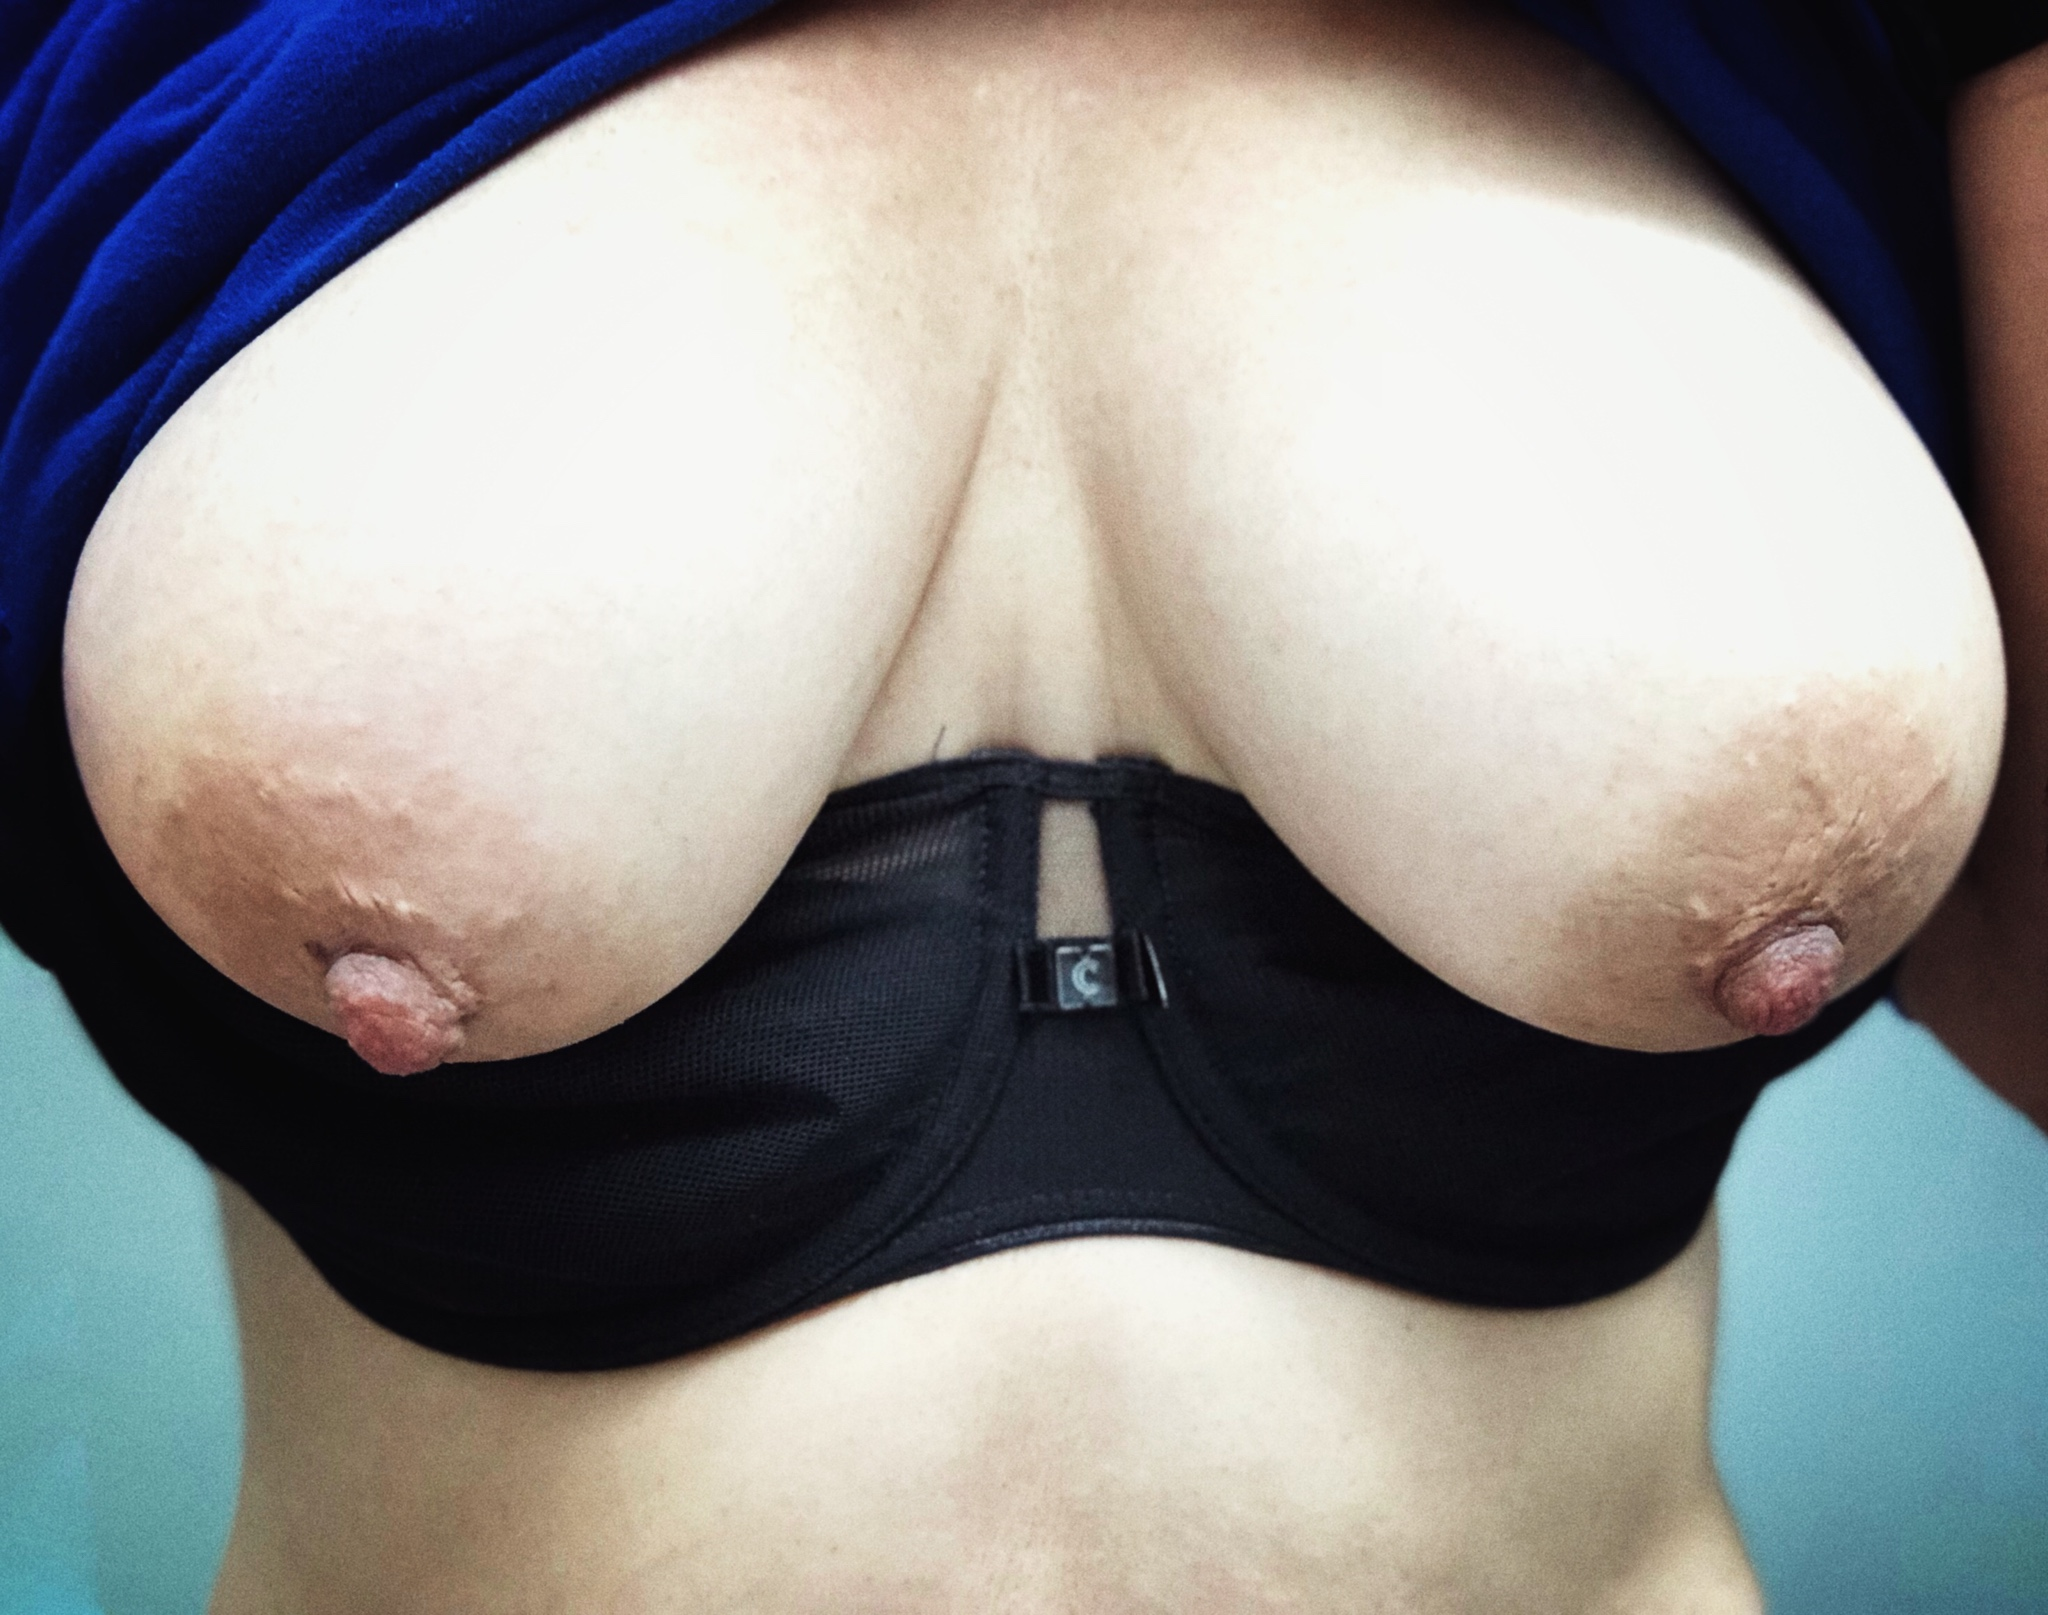 happy friday porn pics